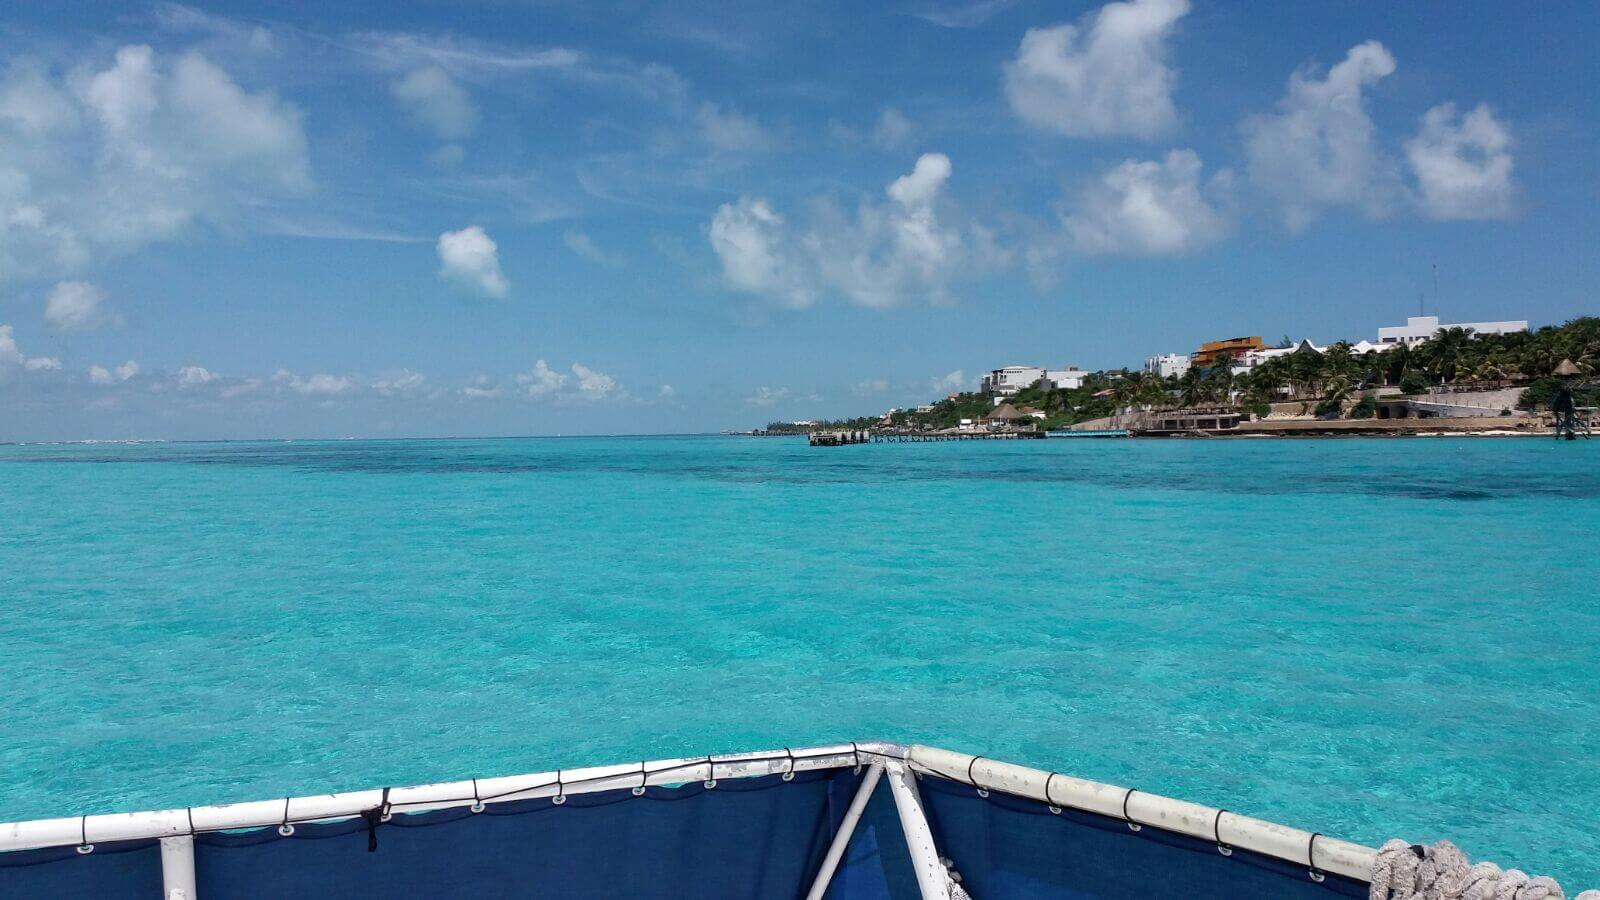 Cancun-Isla-Mujeres-Tours-Snorkel-Beach-All-Inclusive-4